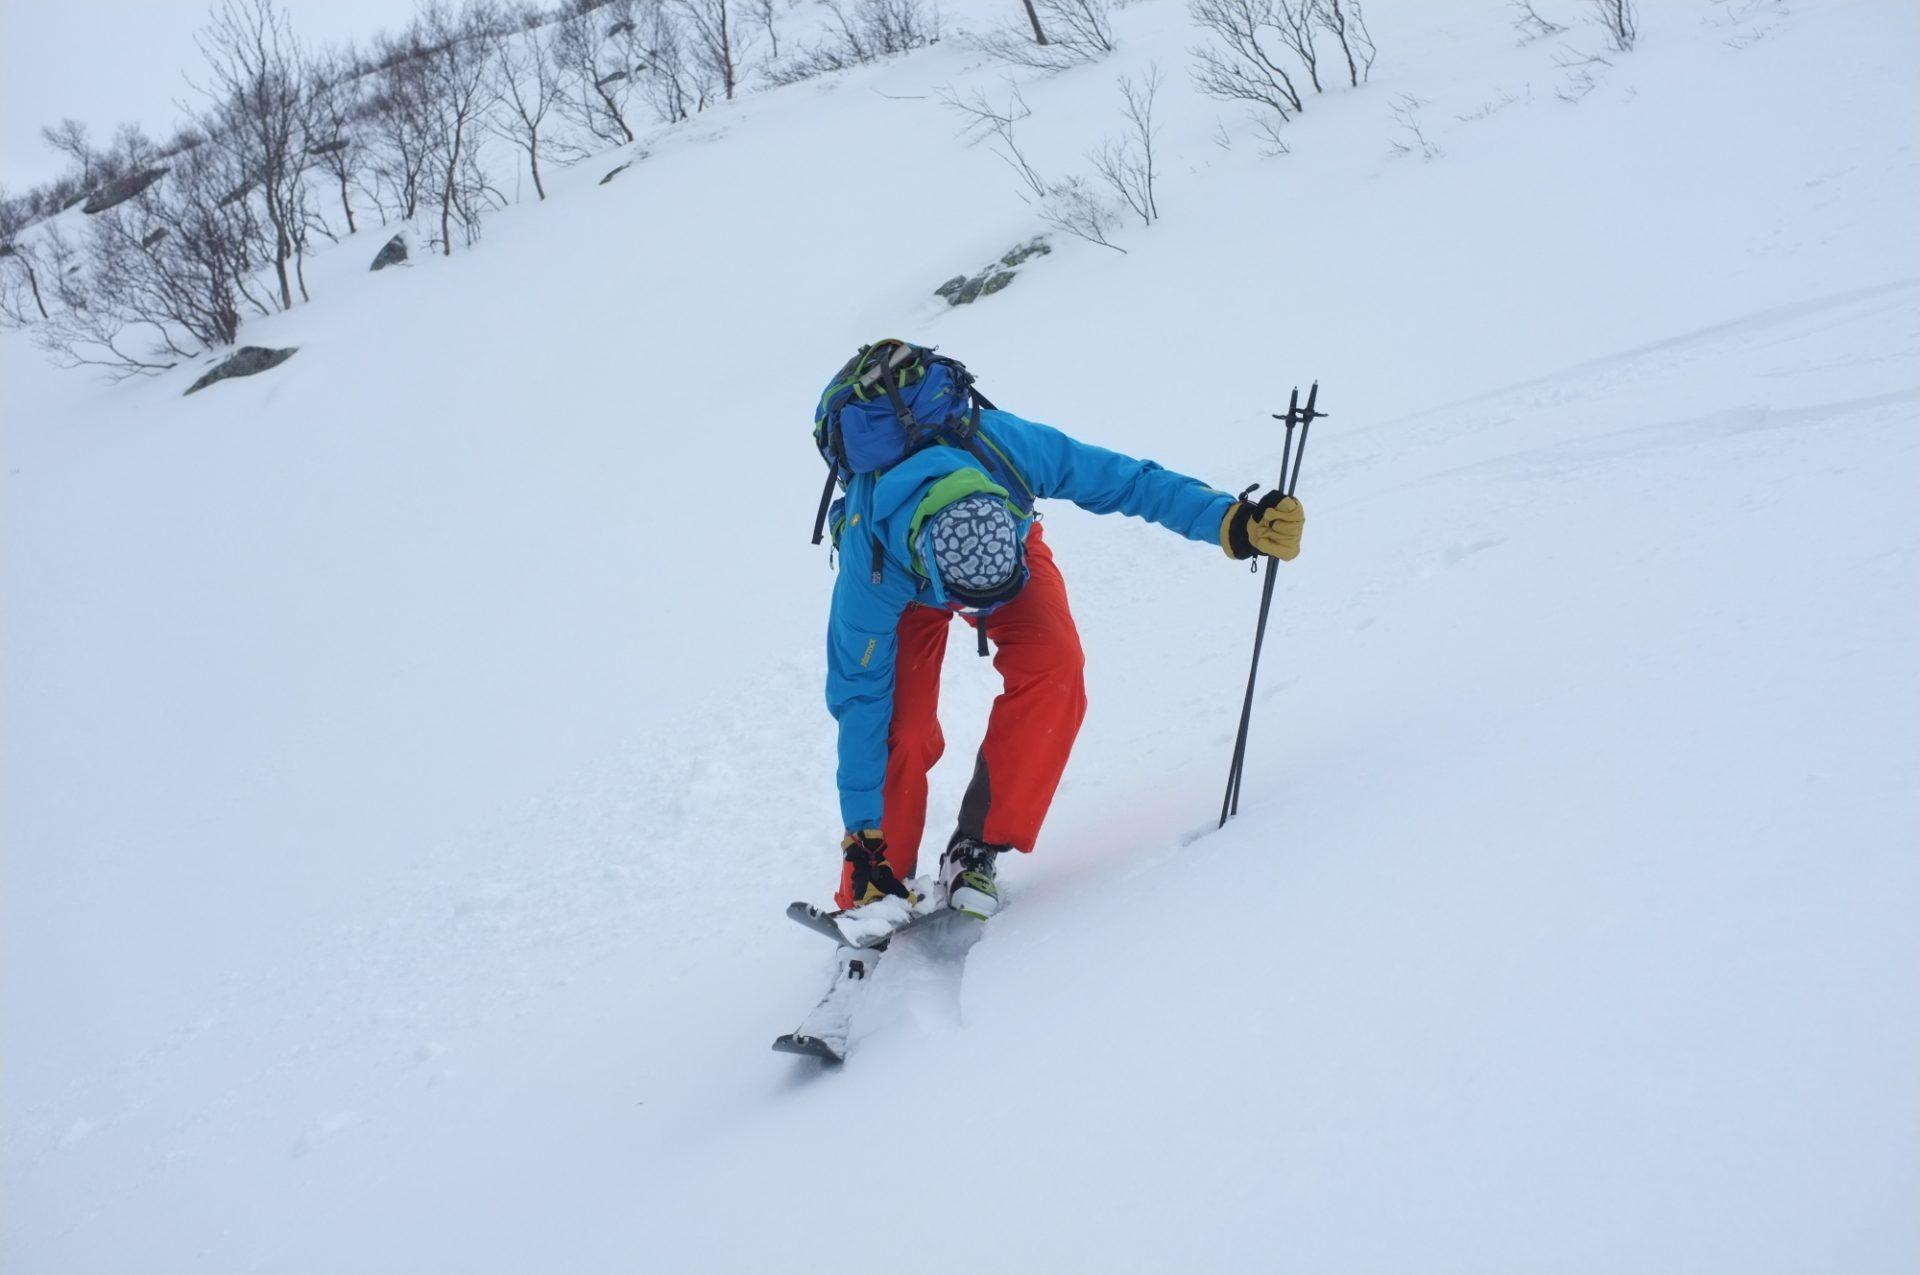 Bergsteigertipp Ski ausziehen 1 I (c) Peter Plattner